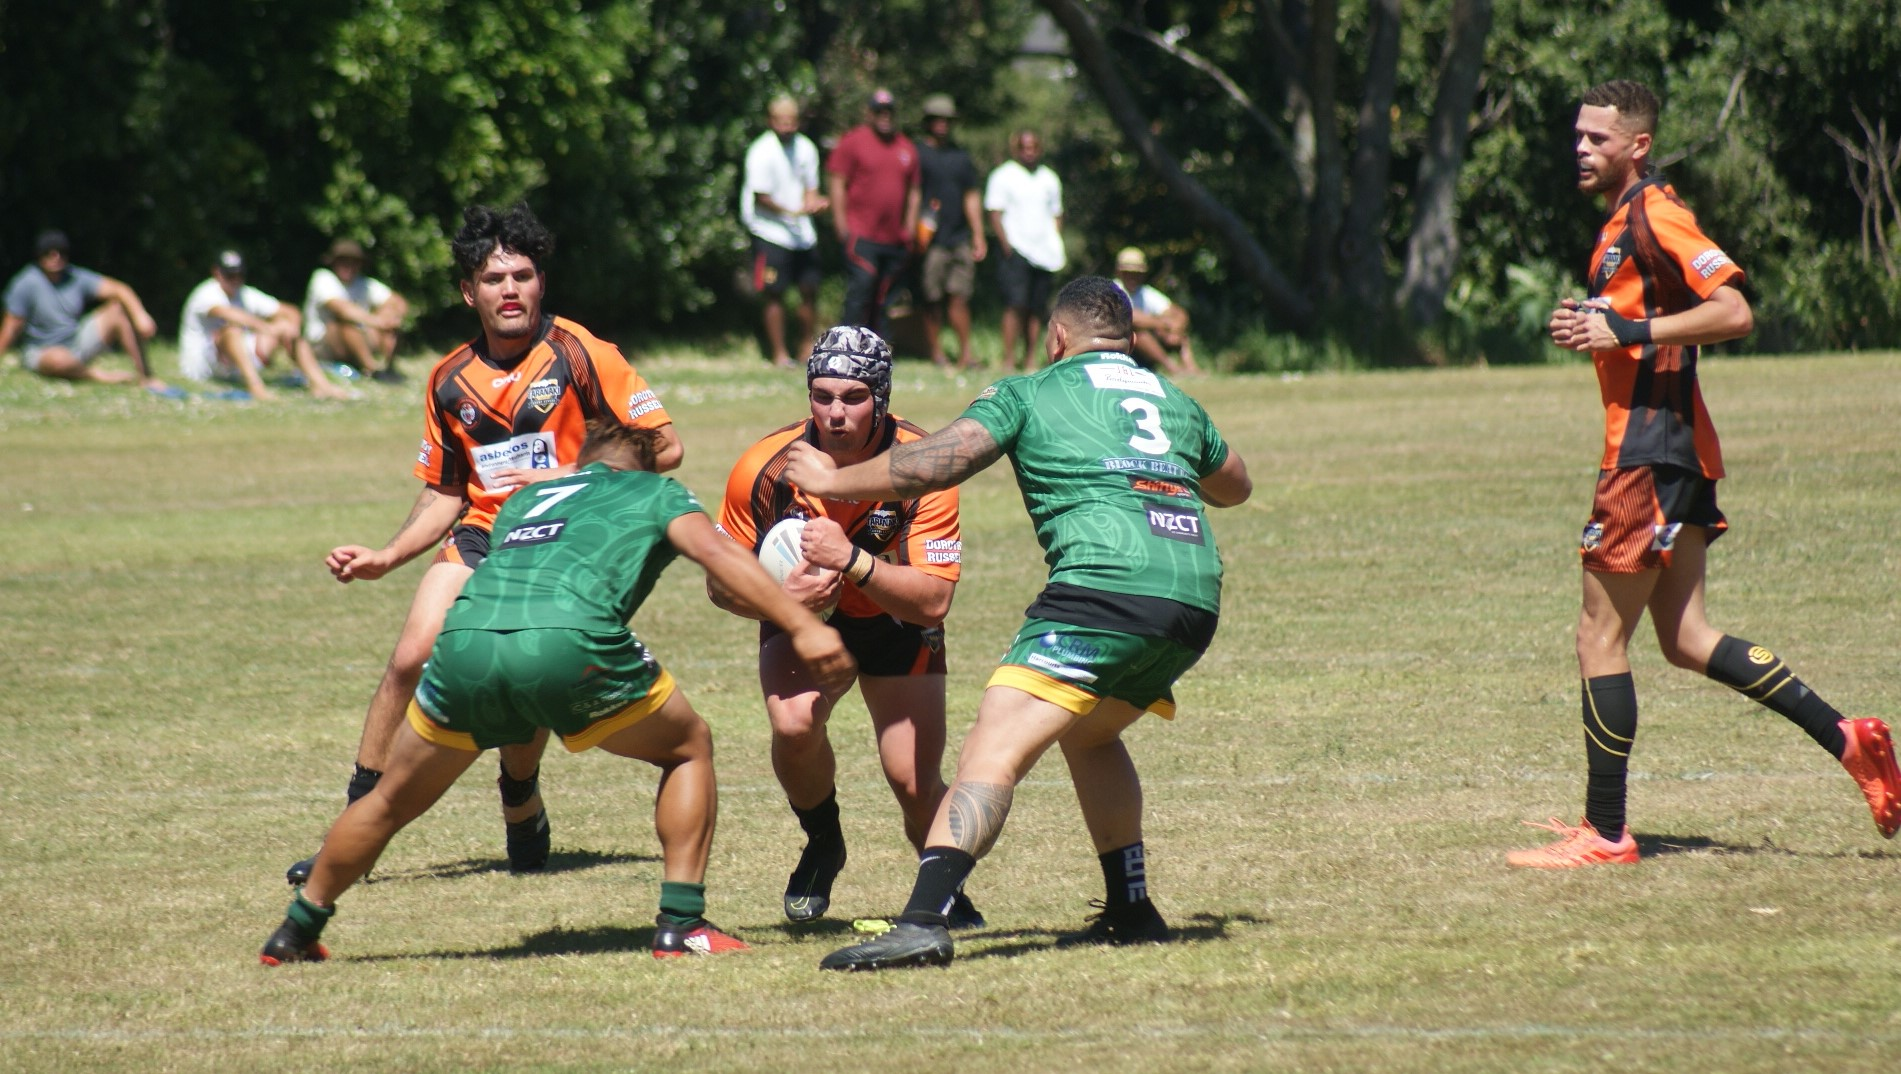 Competitive Rugby League returns to Taranaki